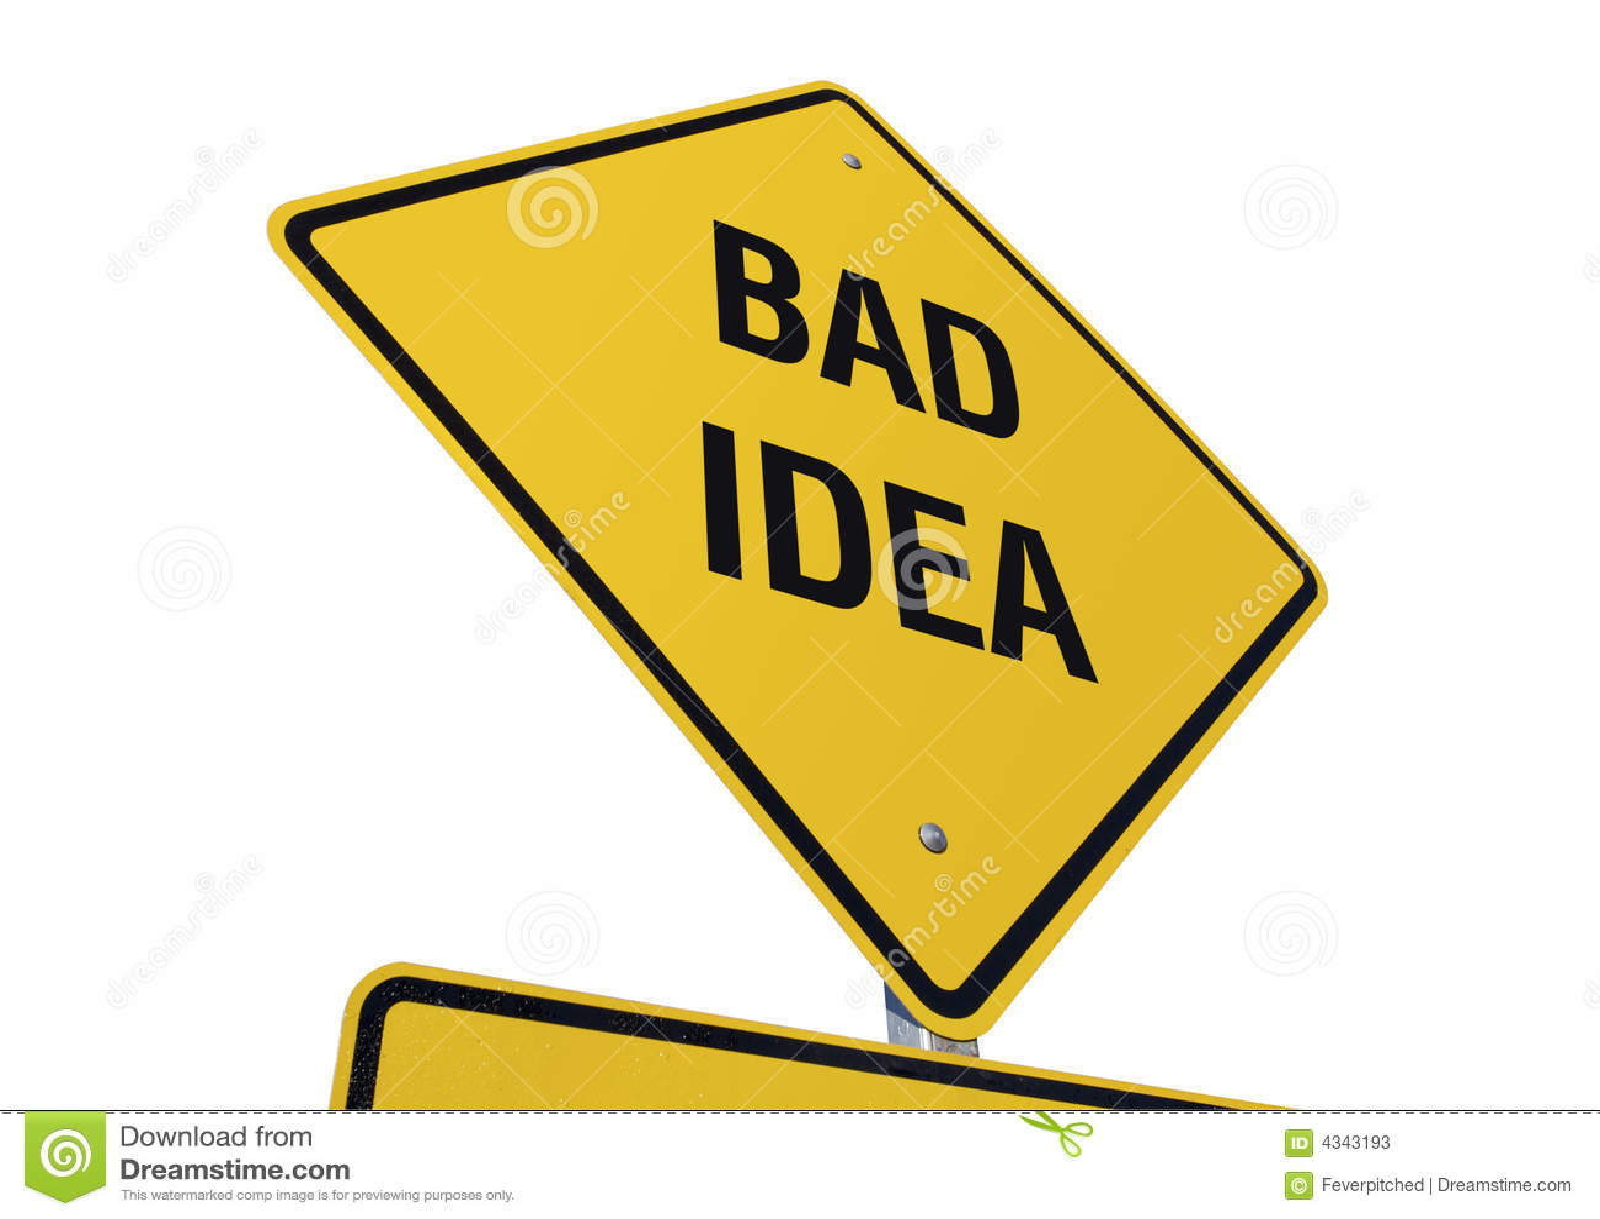 bad idea road sign stock photos image 4343193. Black Bedroom Furniture Sets. Home Design Ideas